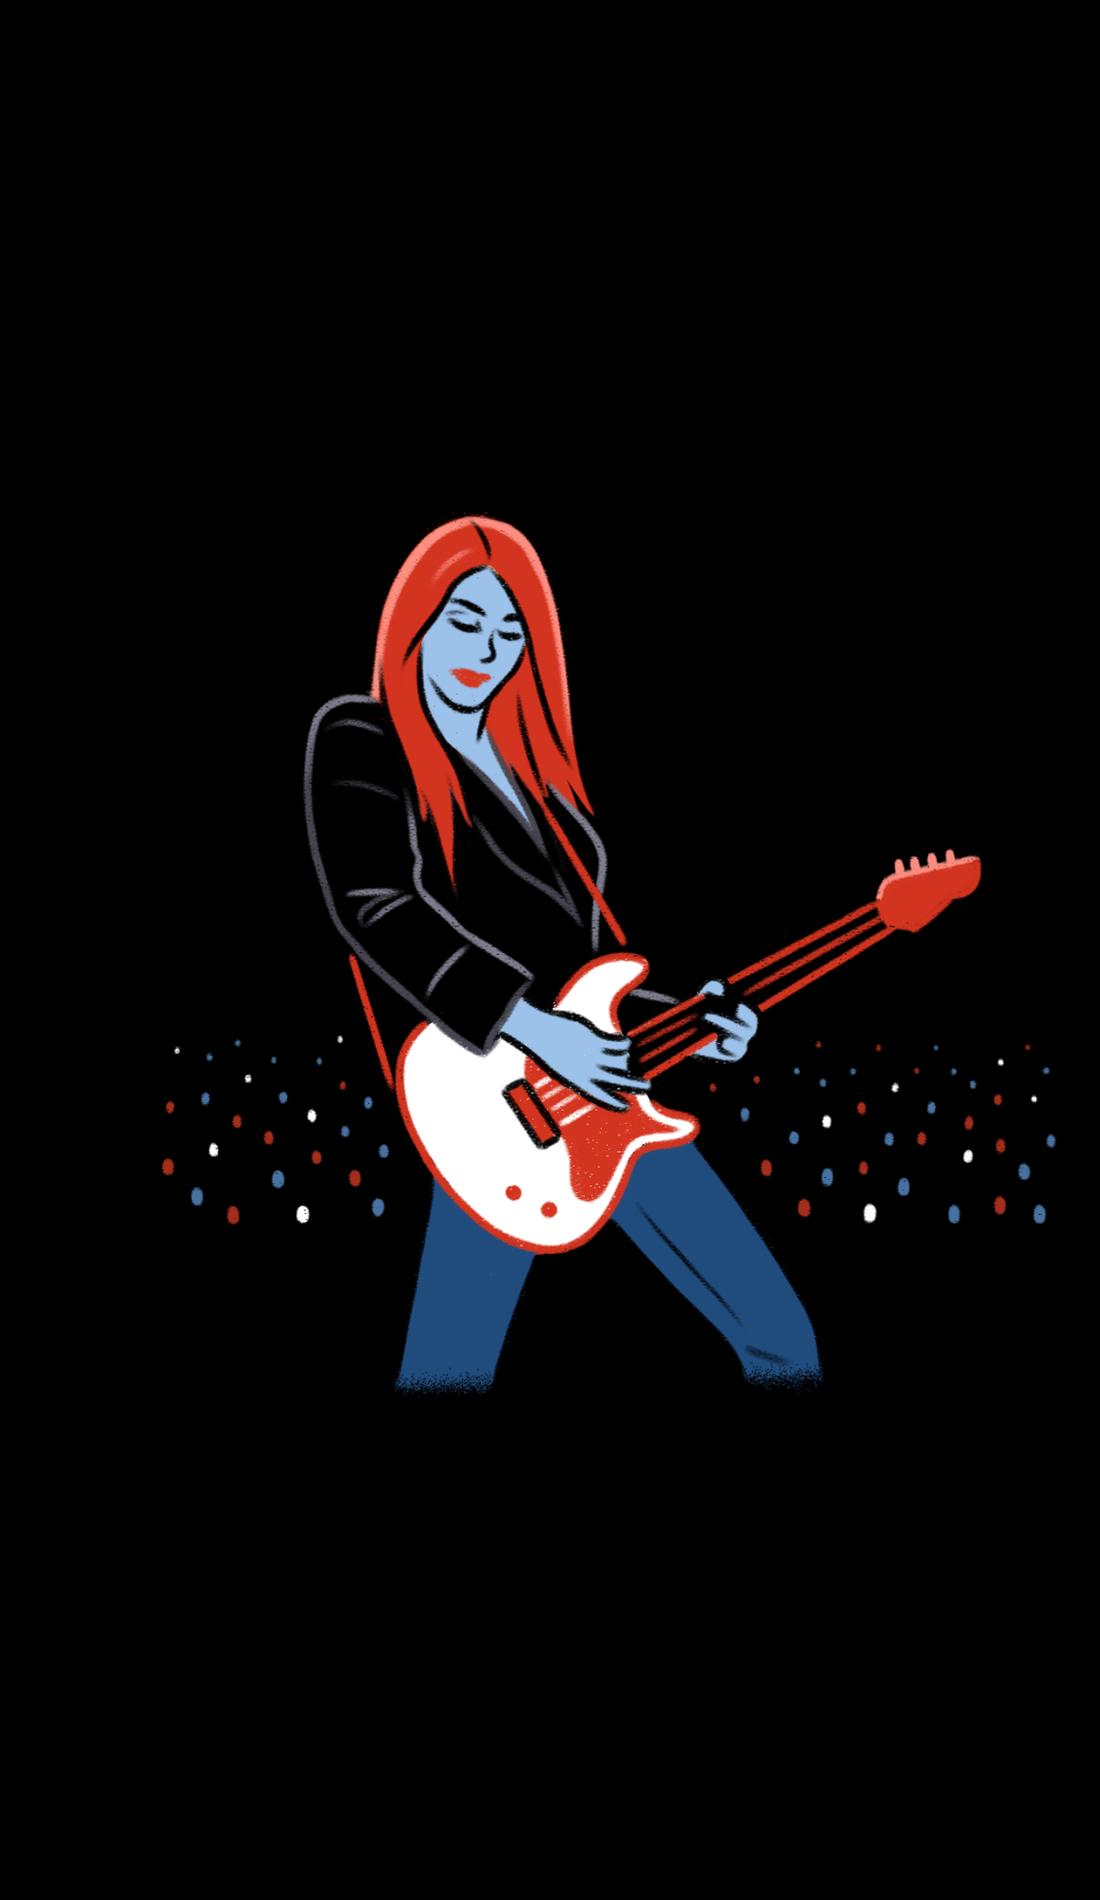 A Start Making Sense: Talking Heads Tribute live event